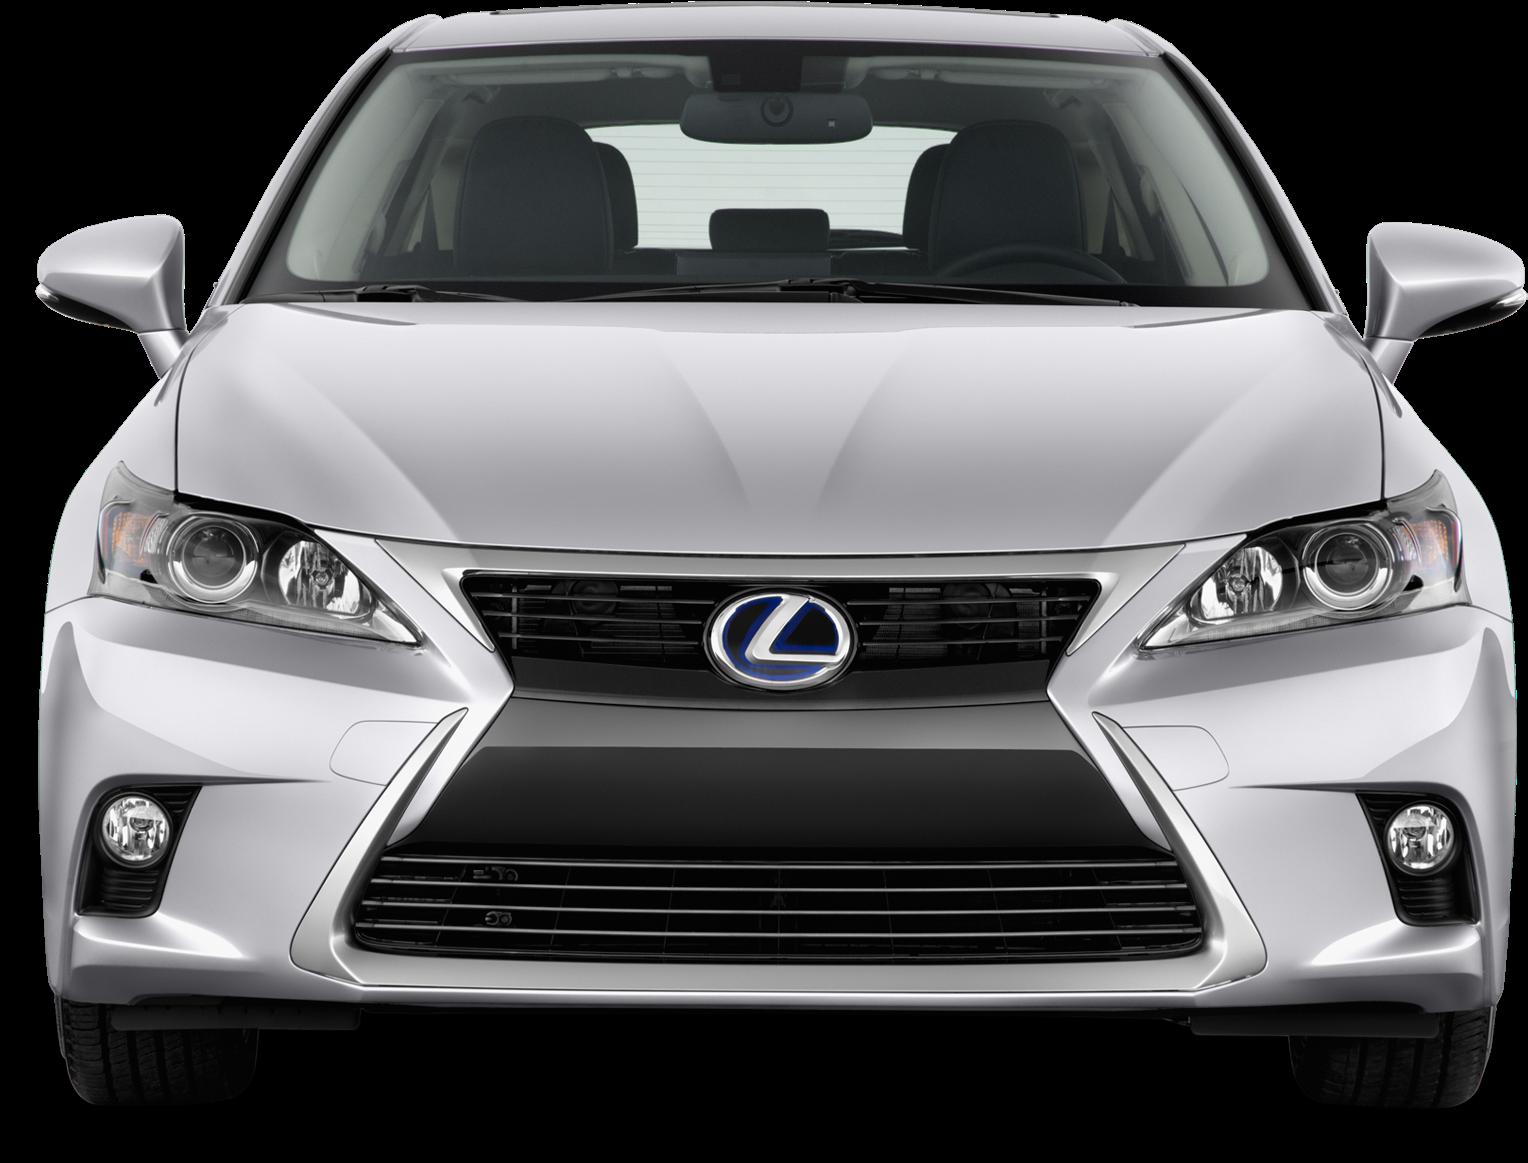 HD Lexus Png.